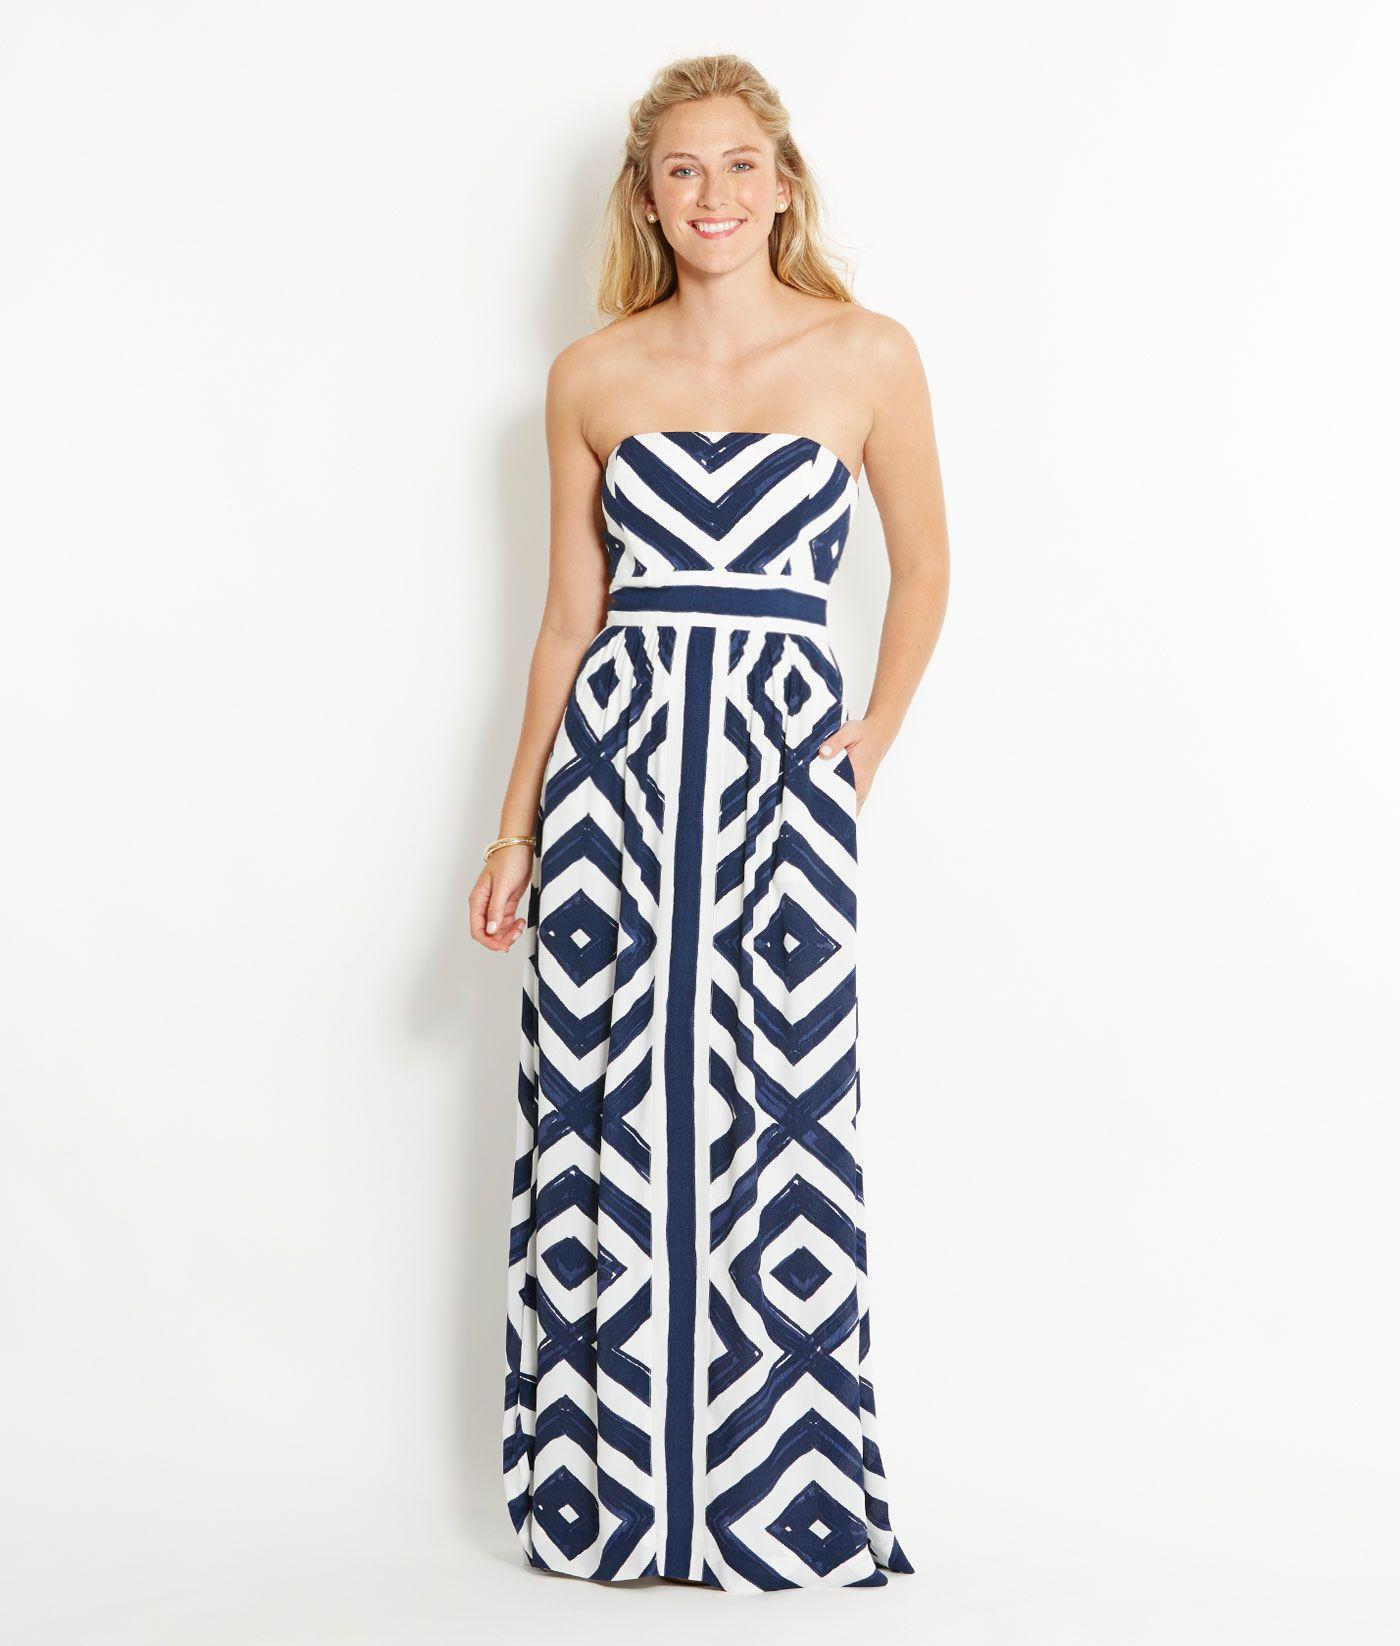 Shop Dresses Diamond Print Maxi Dress For Women Vineyard Vines Printed Maxi Dress Dresses Womens Dresses [ 1646 x 1400 Pixel ]